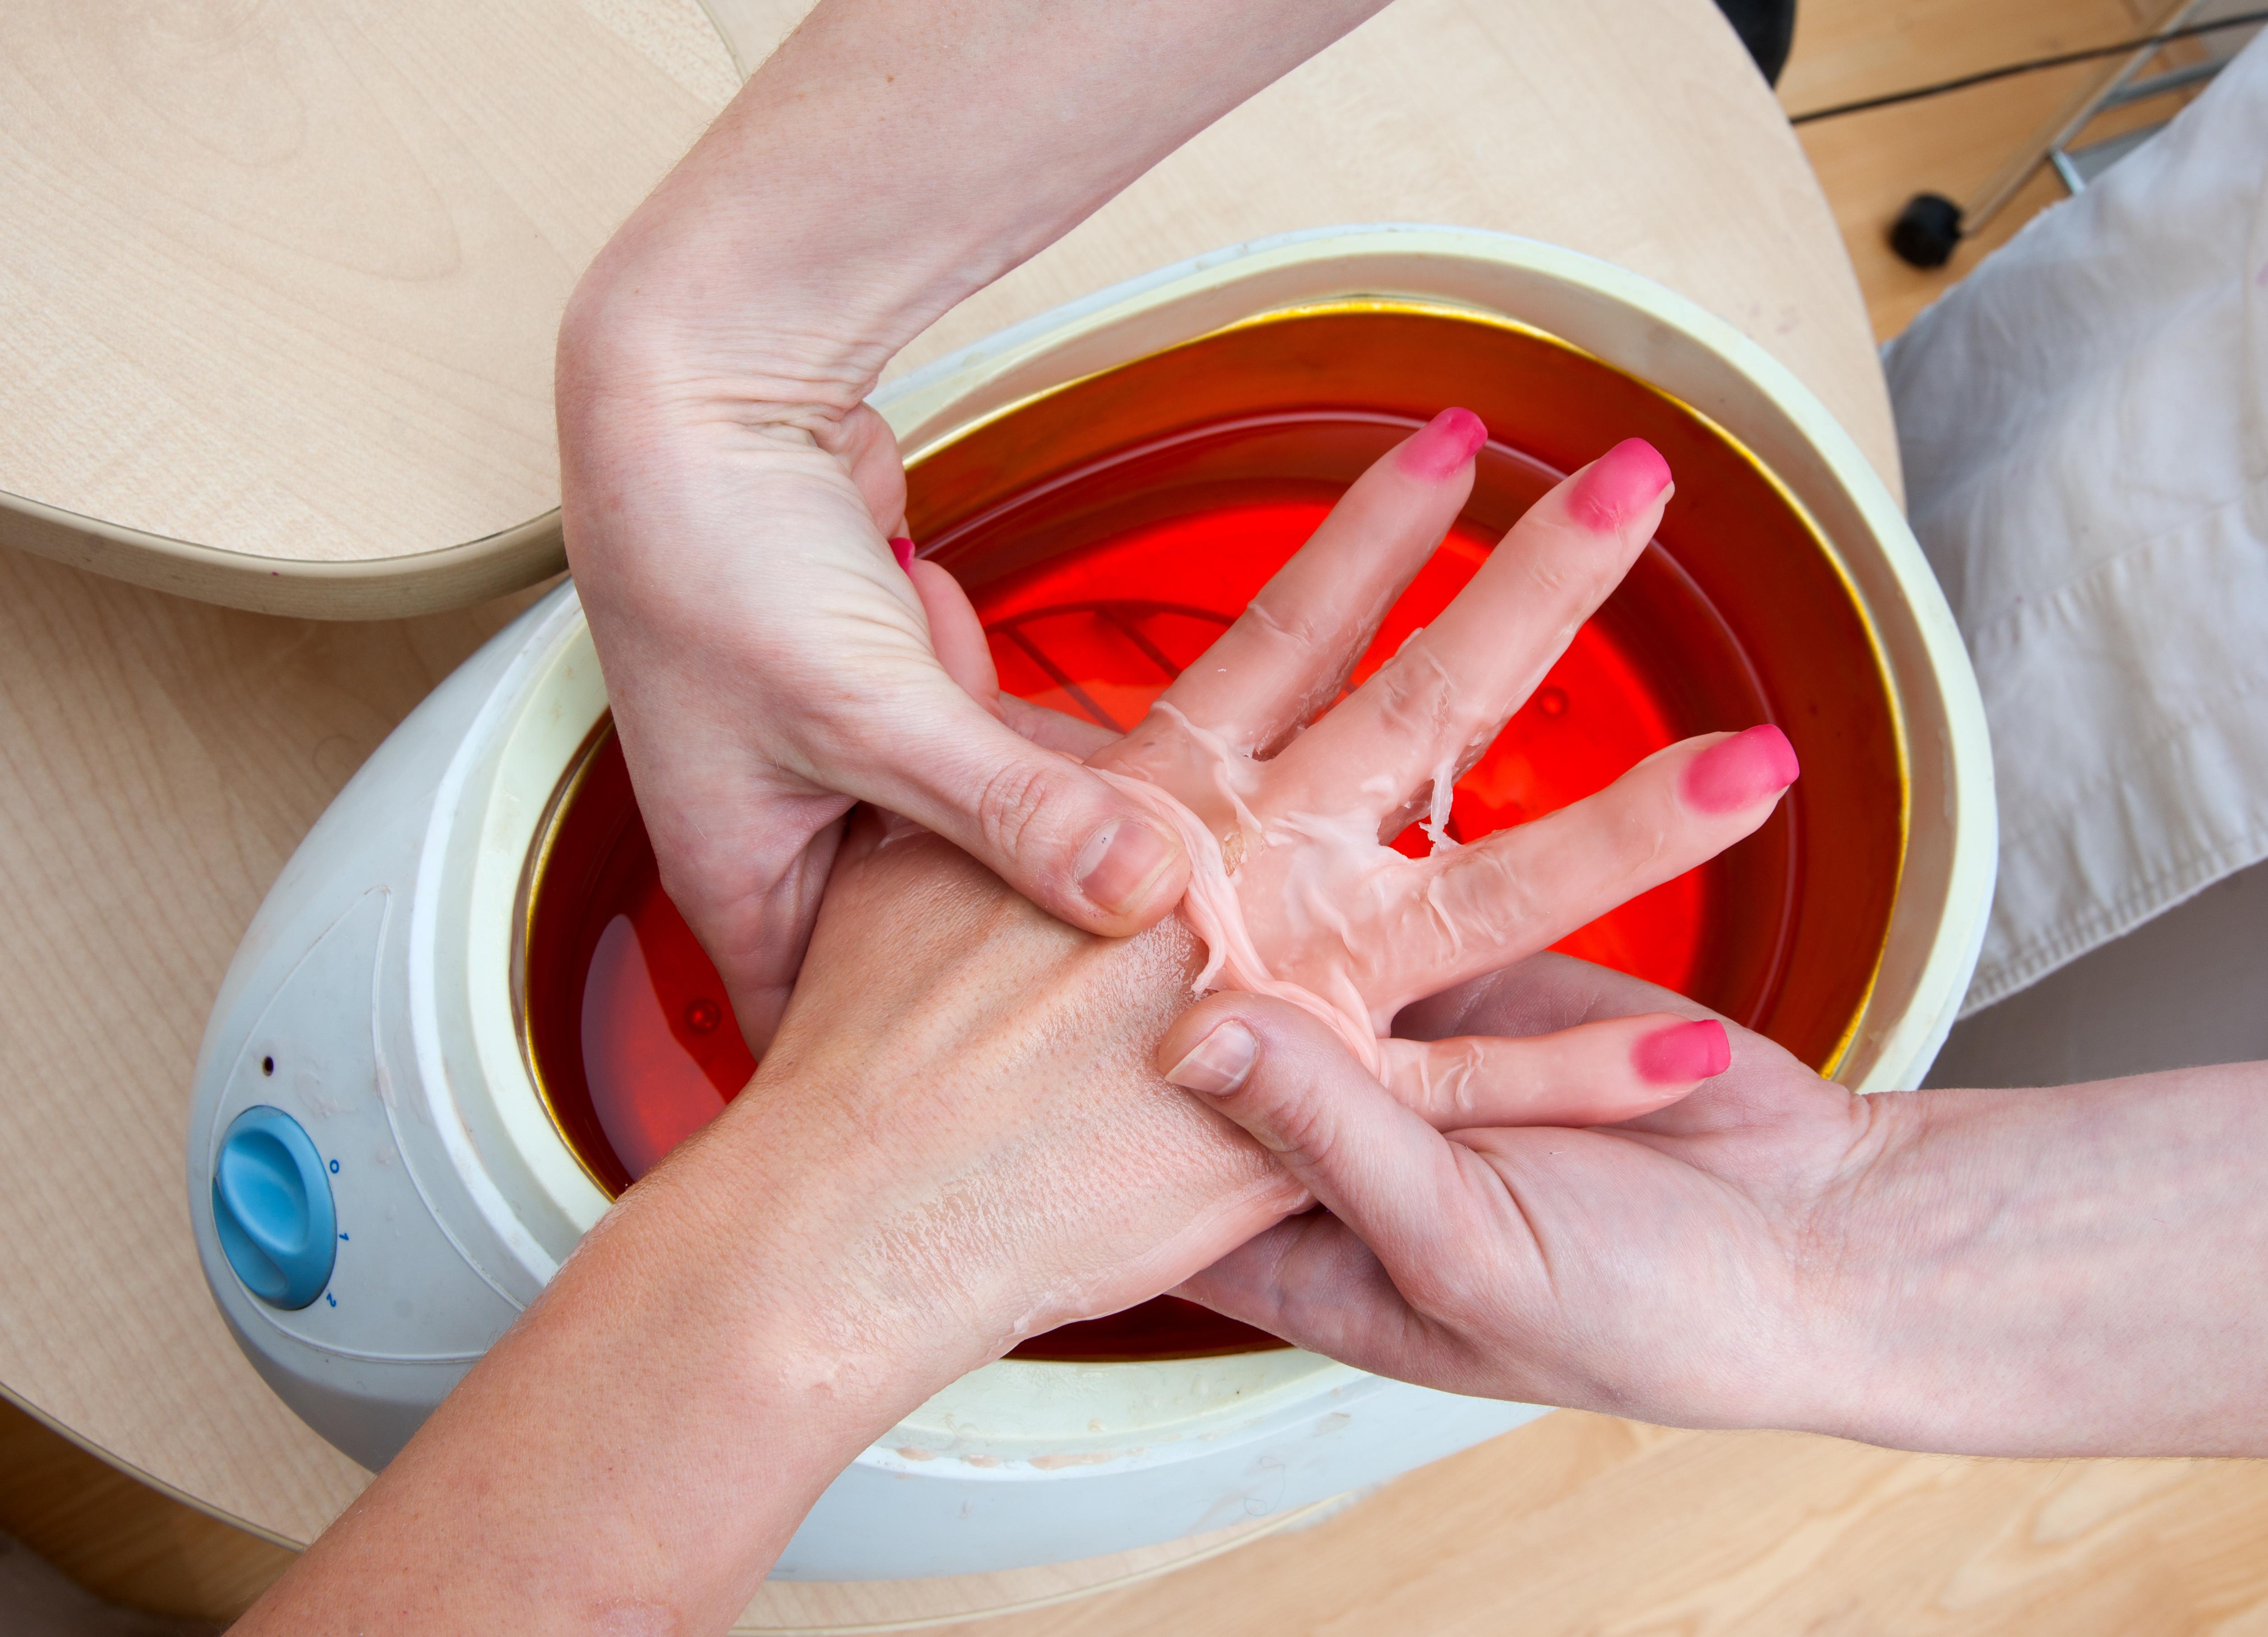 https://0901.nccdn.net/4_2/000/000/008/486/Canva---woman-hand-in-paraffin-bath.jpg